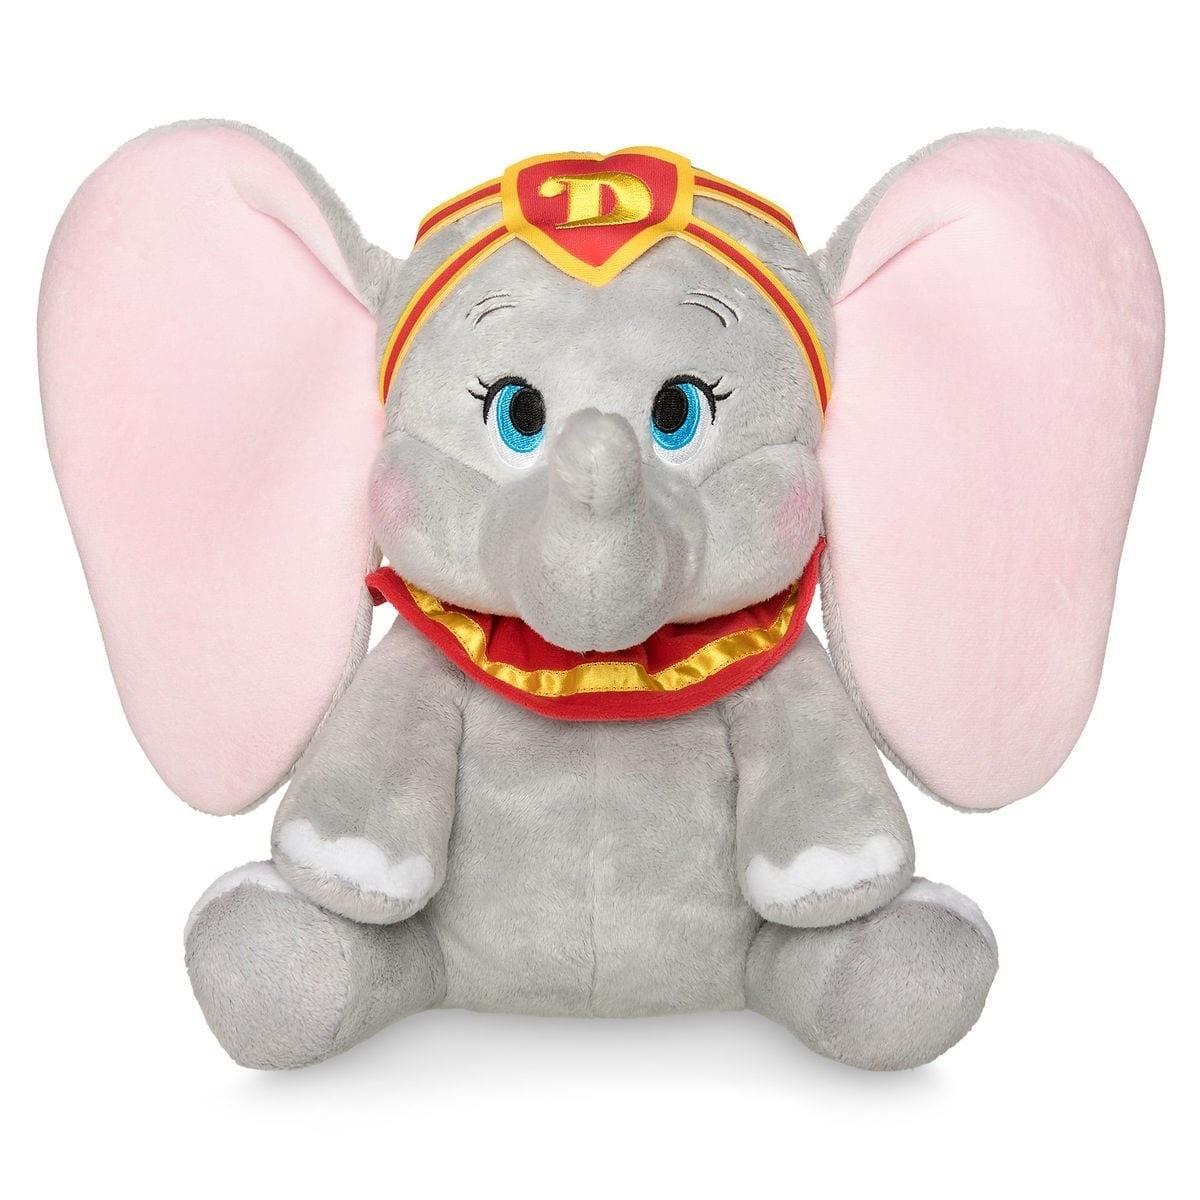 Peluche Dumbo Limitado